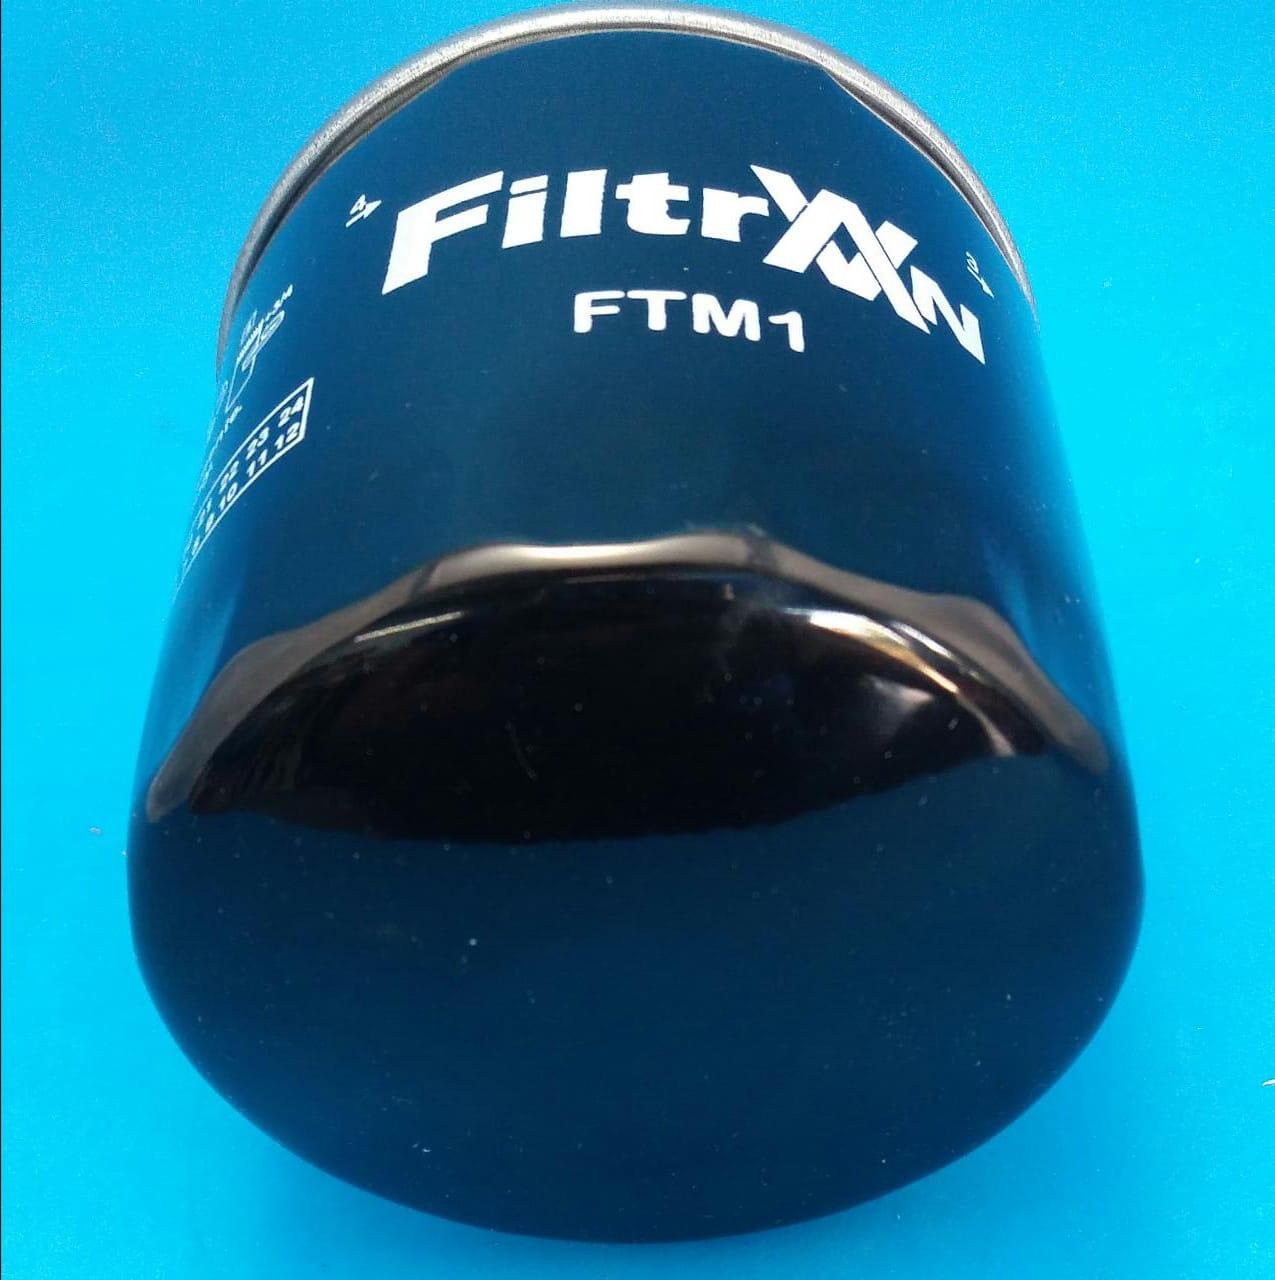 Filtro Oleo-Ka-Gol-Audi-A4-Voyage-Cheroke-Fusion-Escort-FTM1